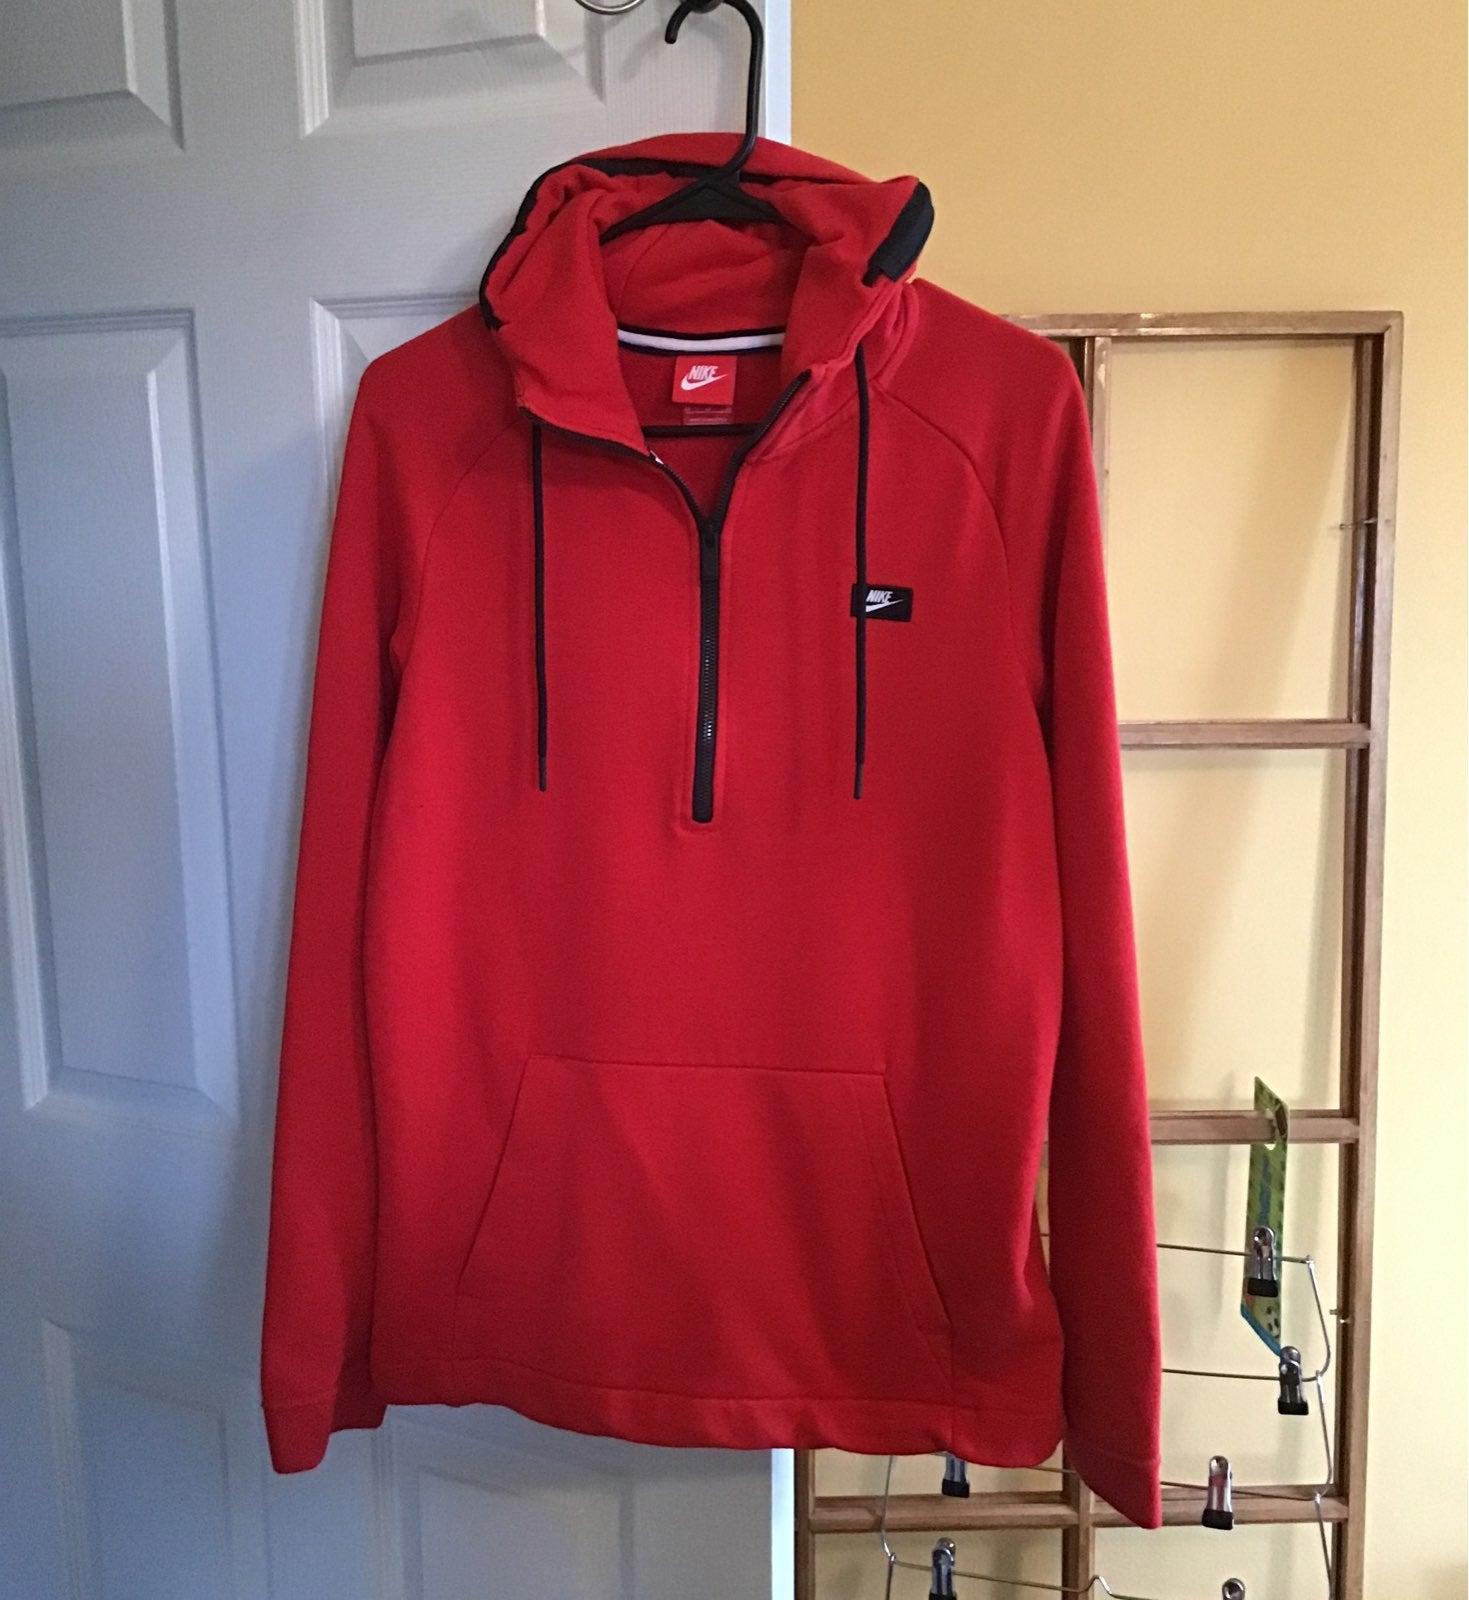 Nike hooded pullover 1/4 zipper mens M